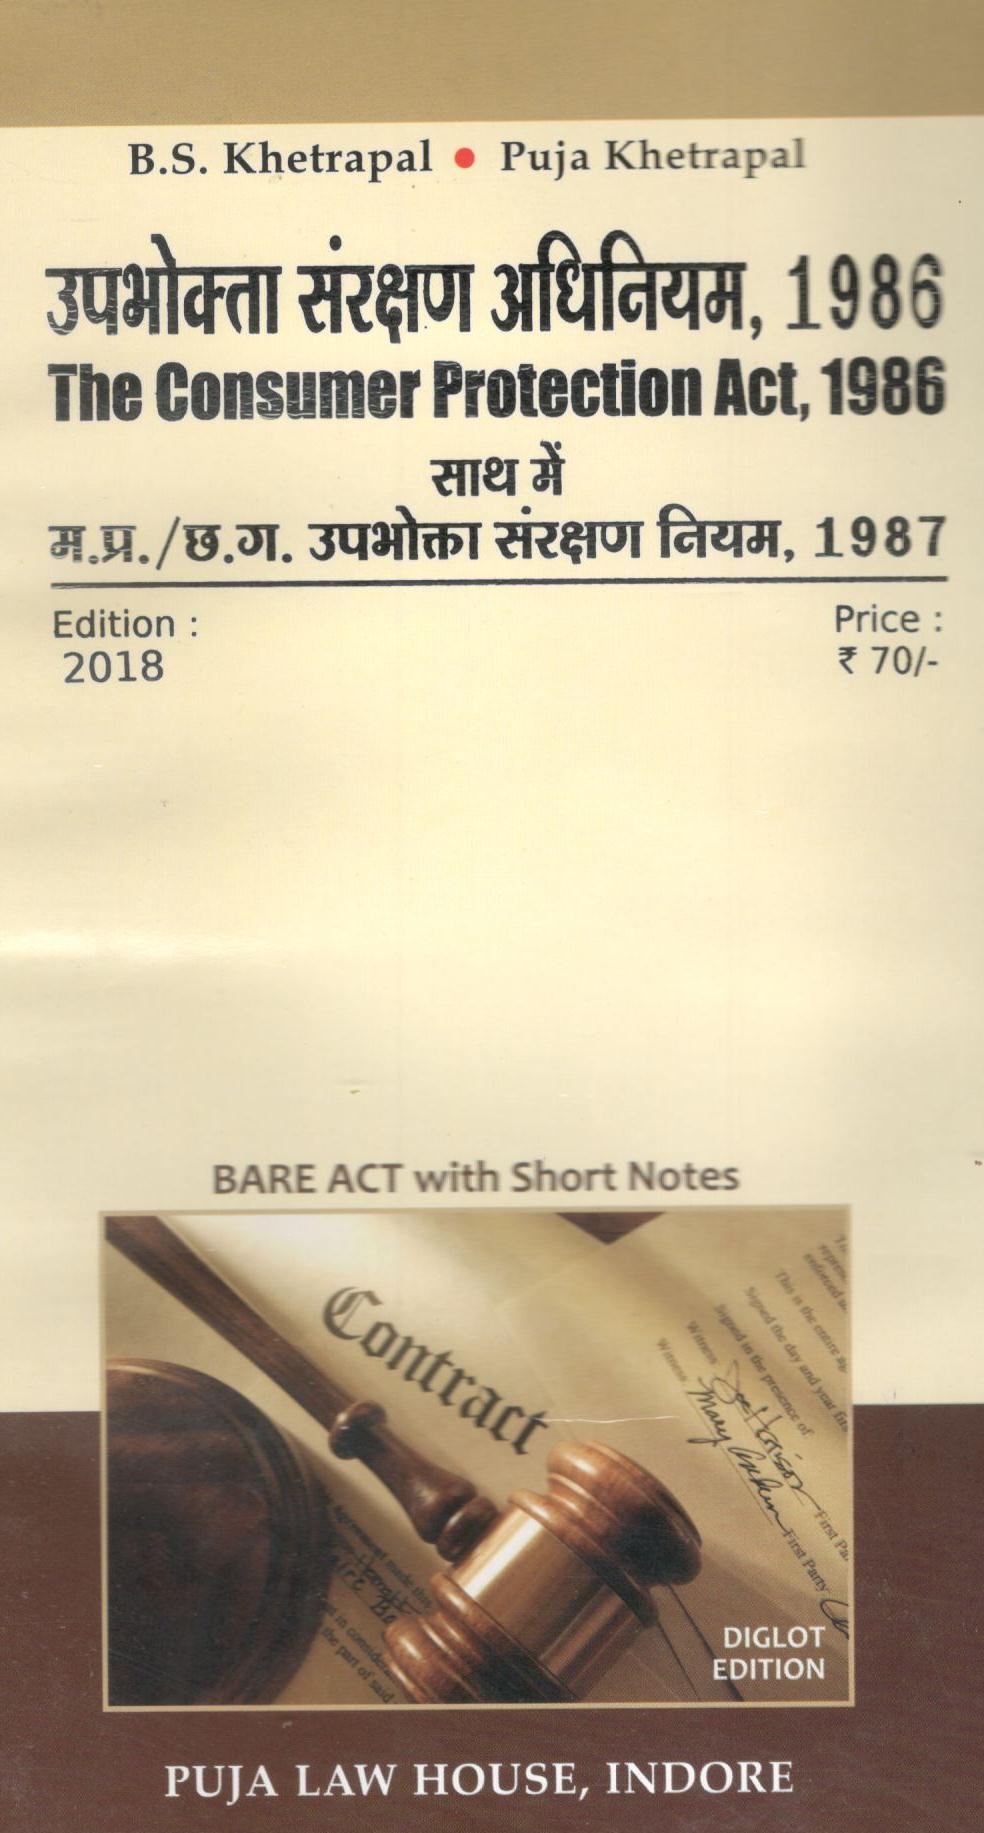 उपभोक�ता संरक�षण अधिनियम, 1986 / Consumer Protection Act, 1986